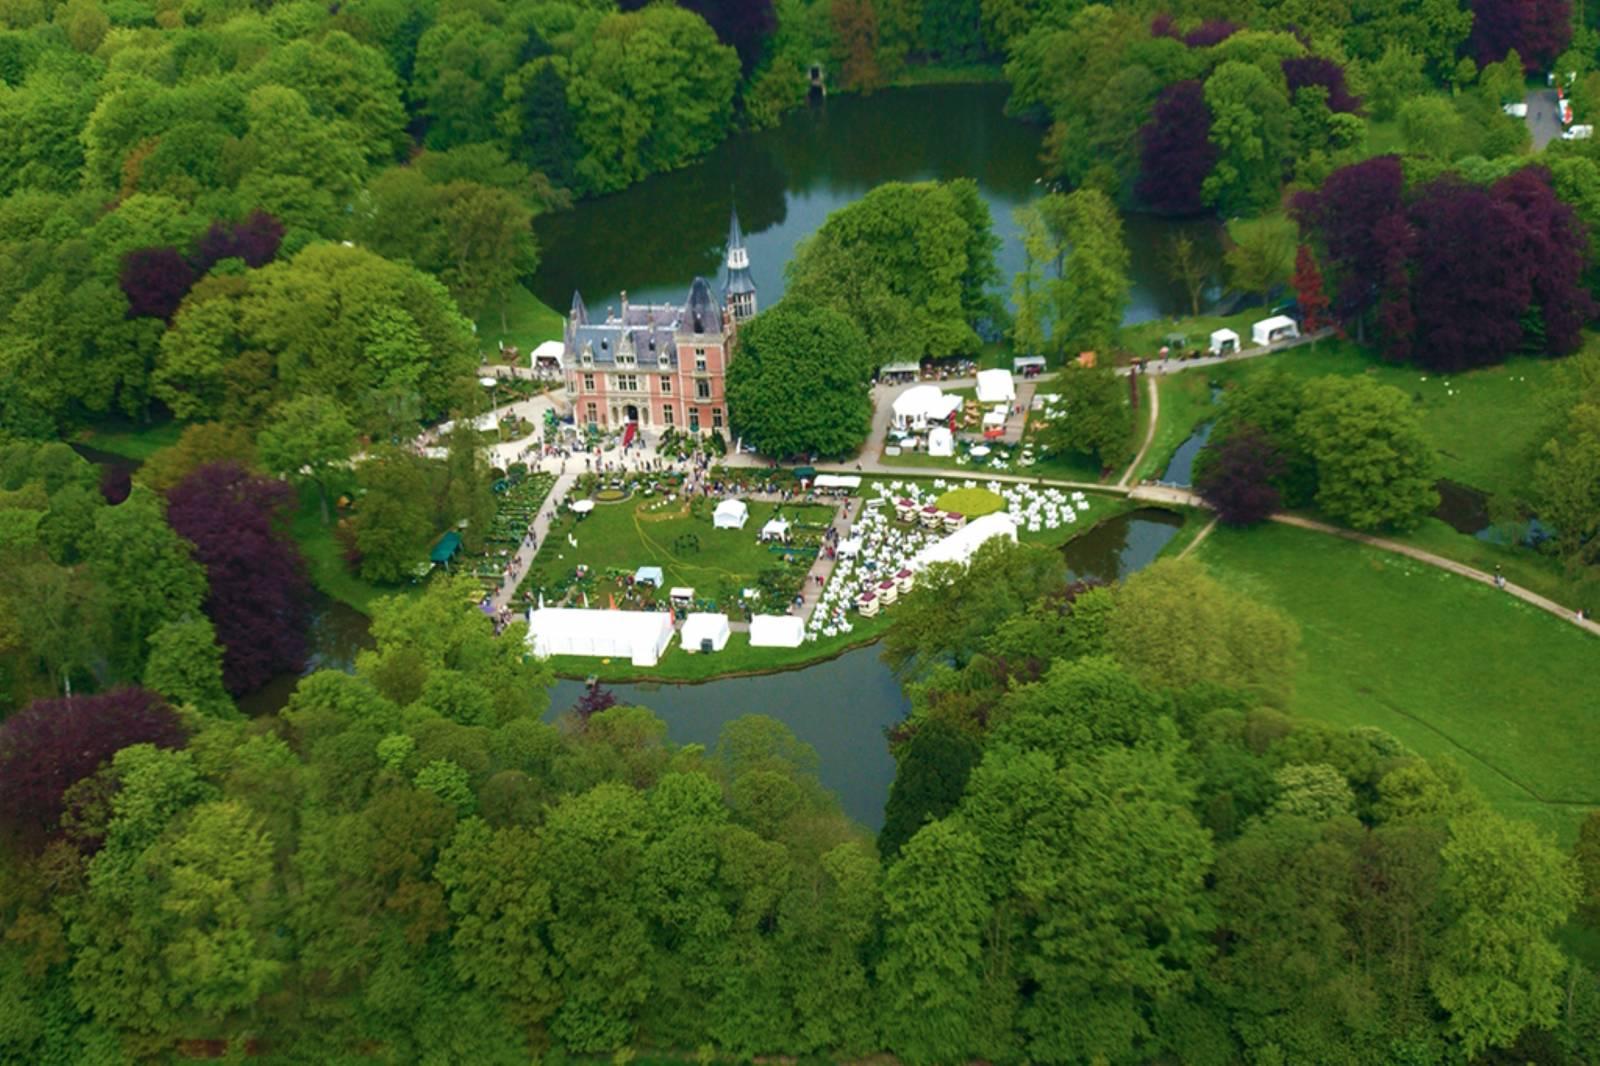 Kasteel D'artrycke - Feestzaal - House of Weddings (1)